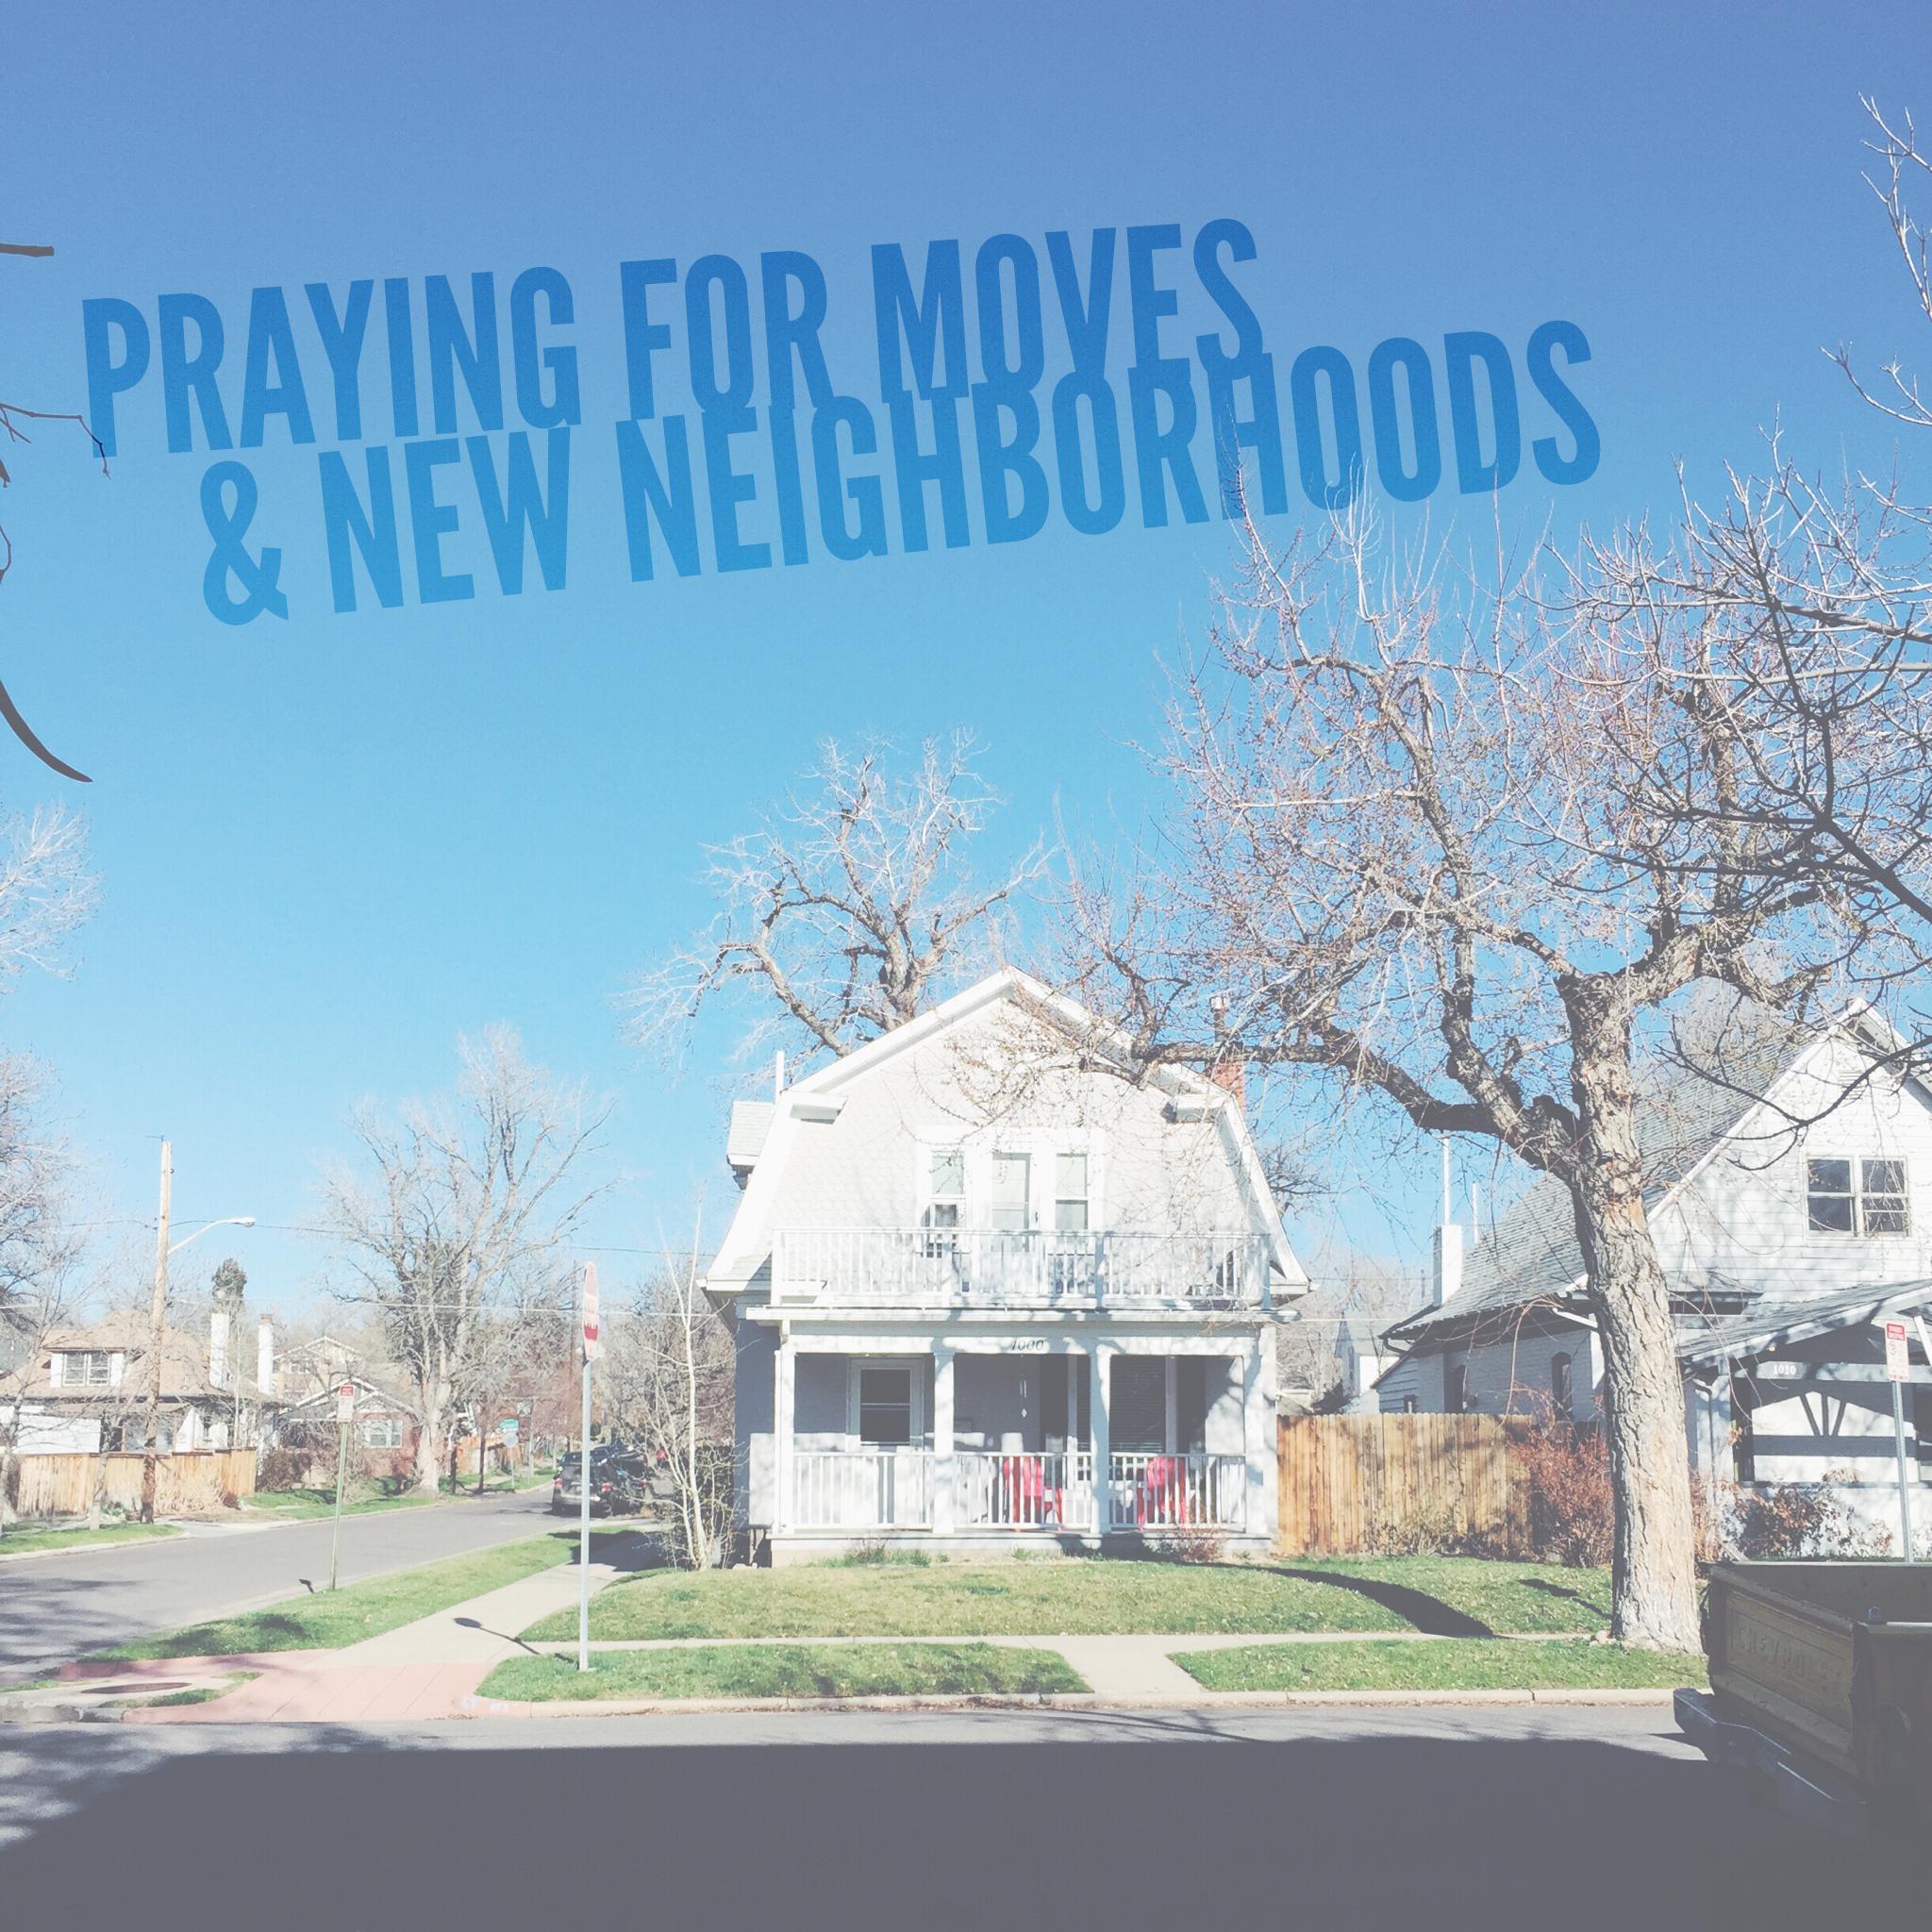 Moves & Neighborhoods